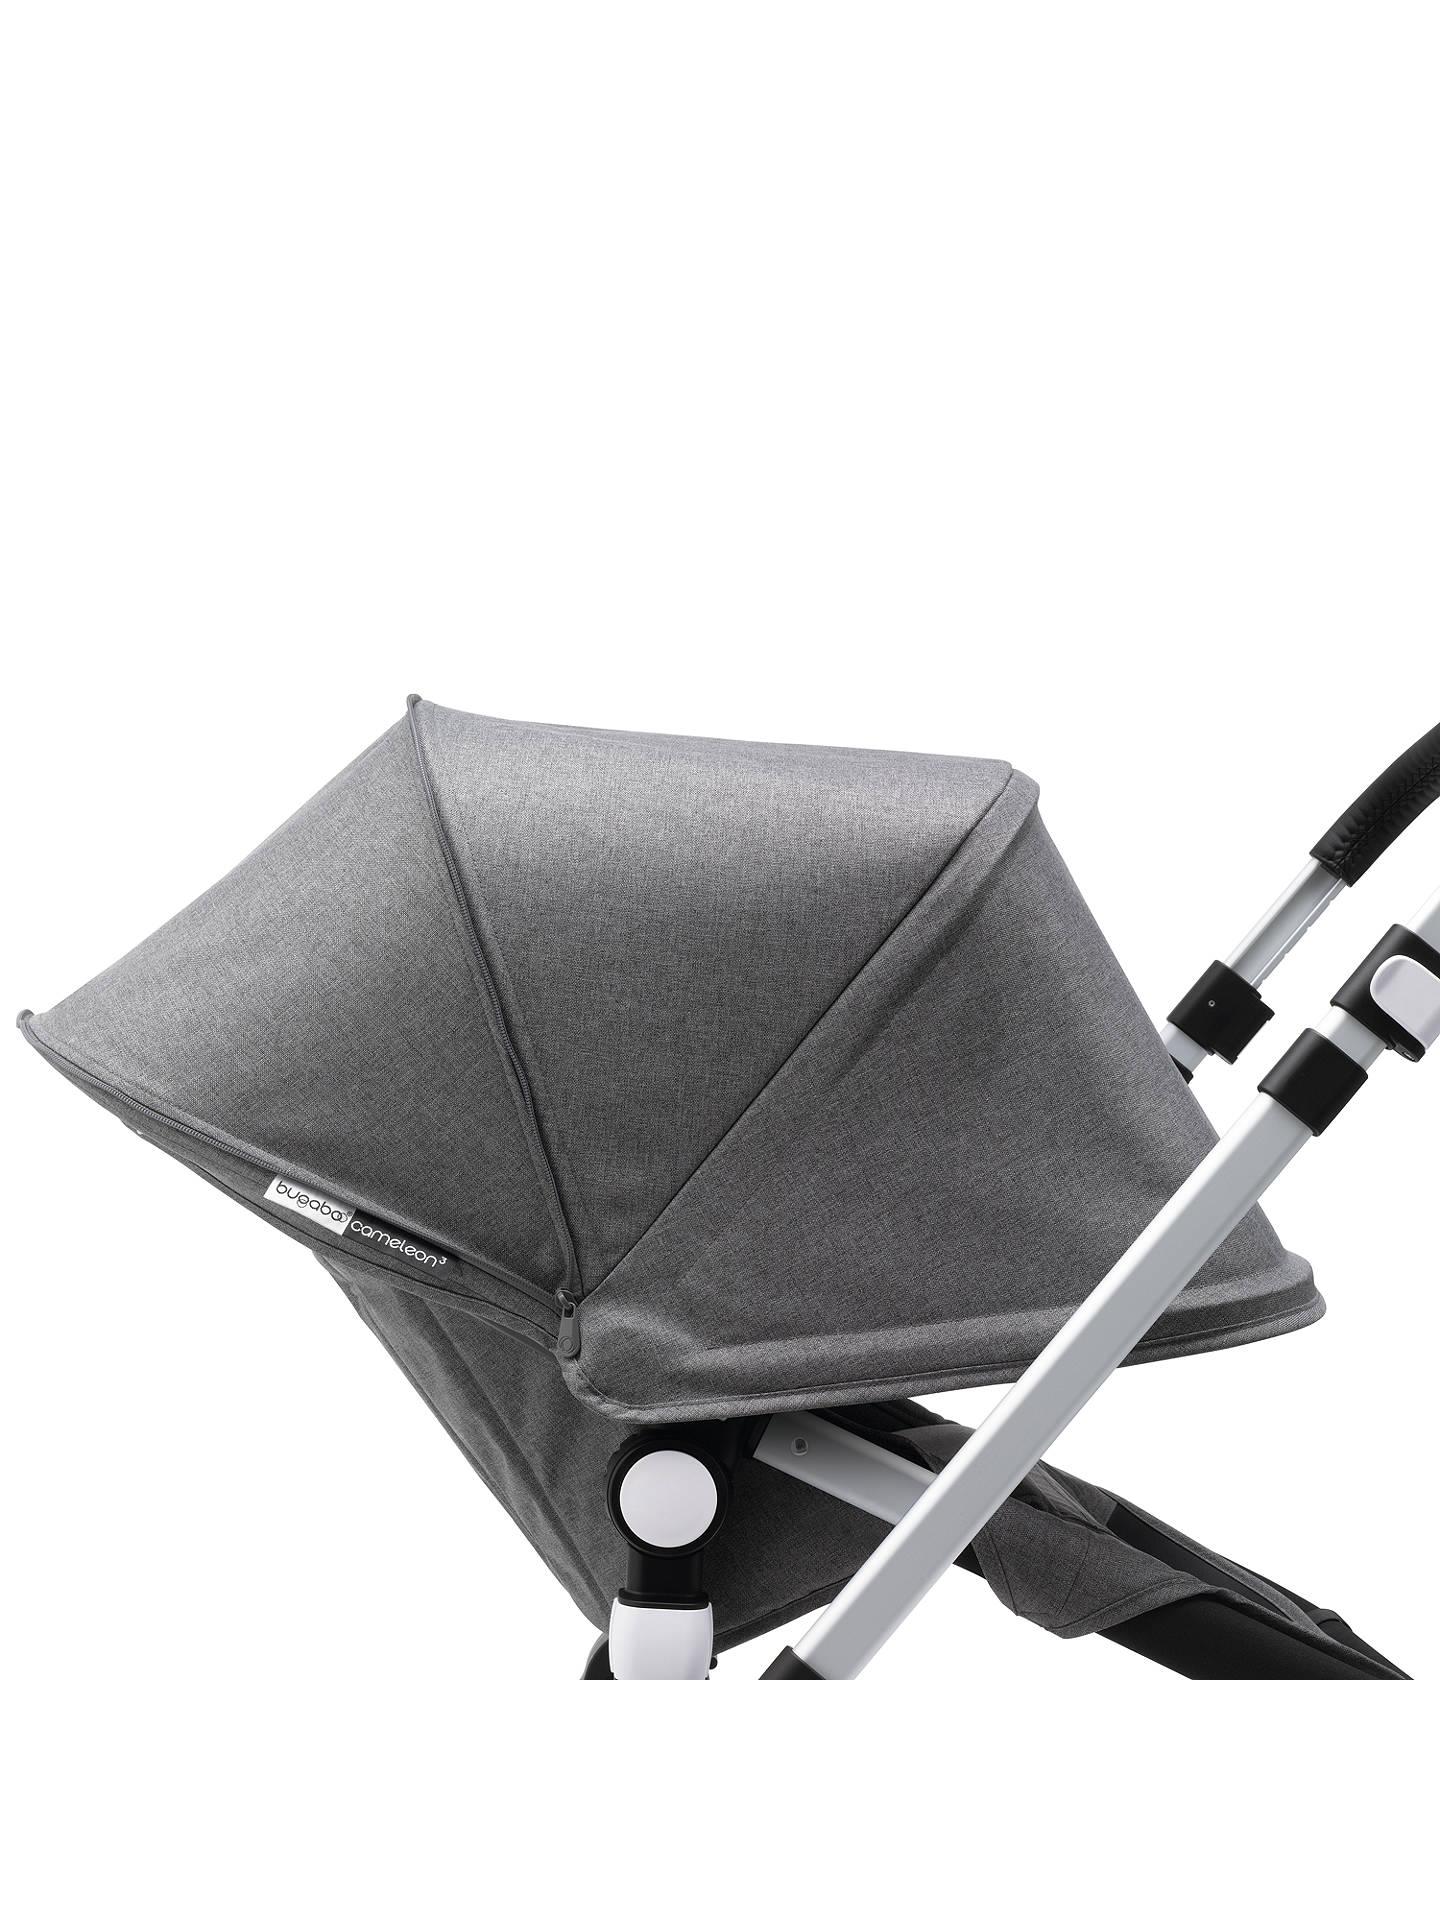 timeless design 57cdb ef79b ... Buy Bugaboo Cameleon3 Classic+ Complete Pushchair, Grey Melange Online  at johnlewis.com ...